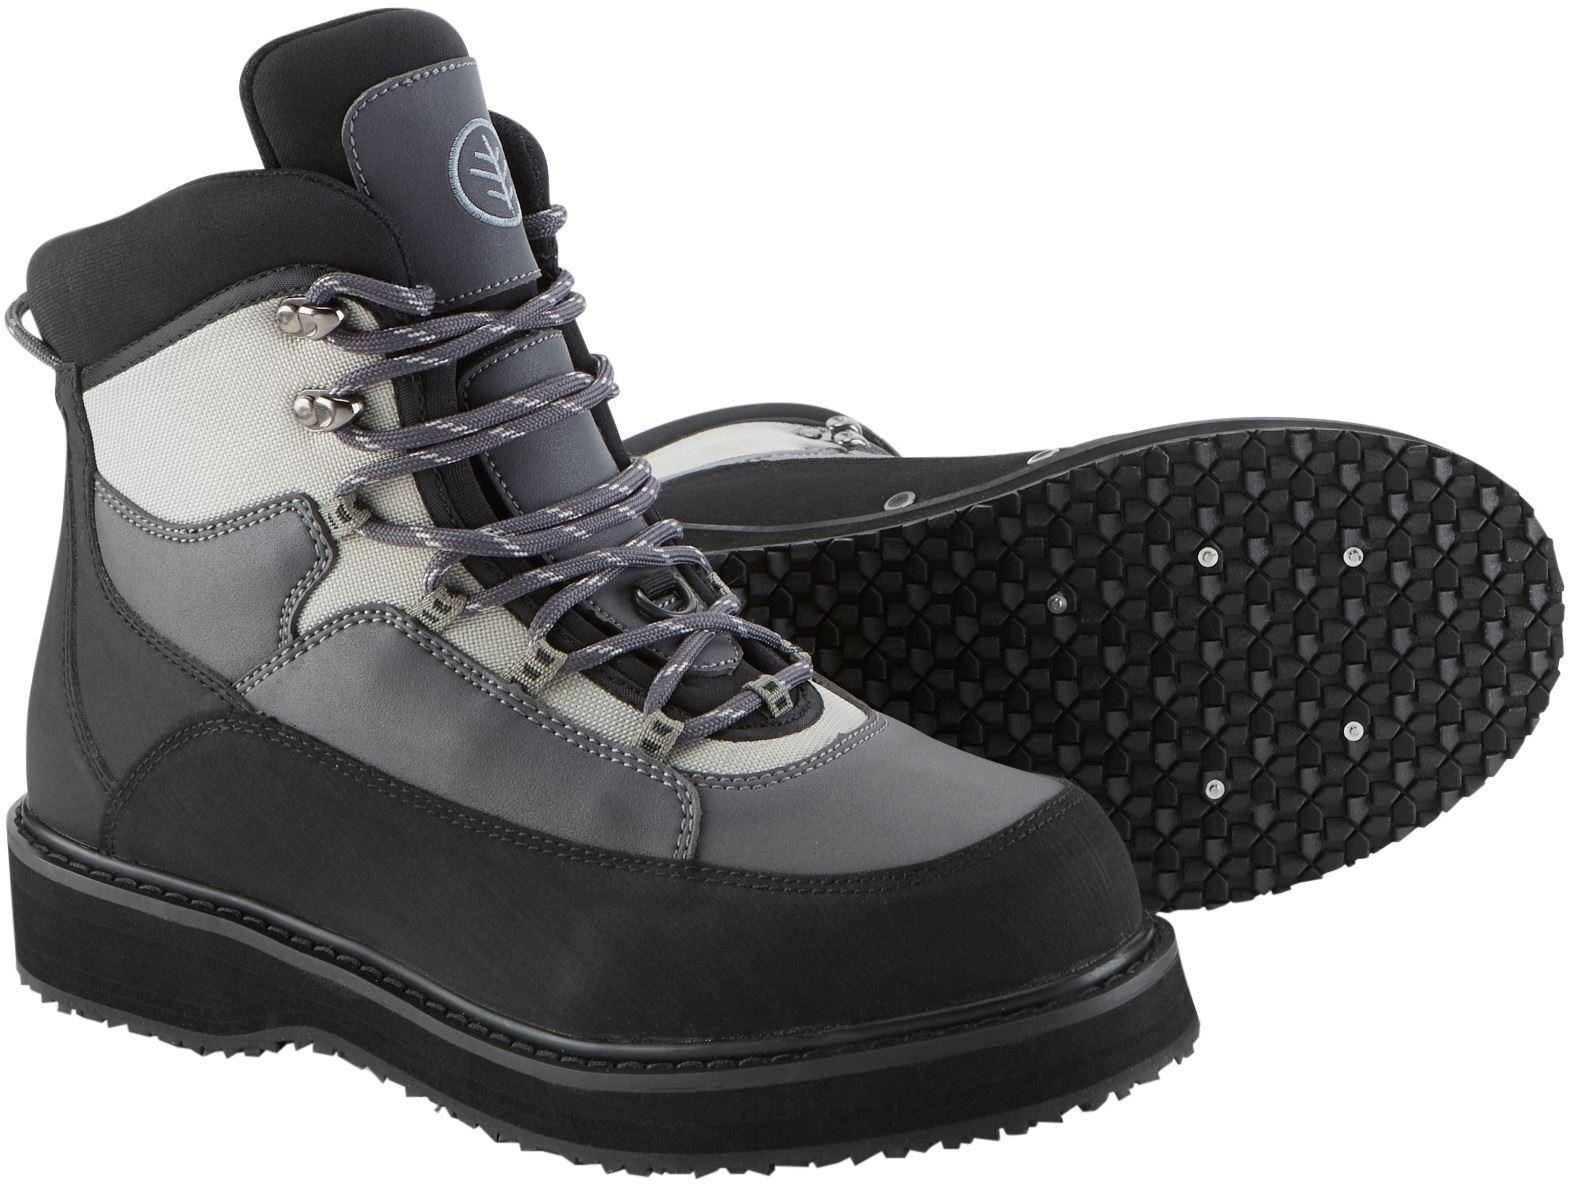 Wychwood Gorge Gorge Gorge Wading Stiefel SDS 2d7c18